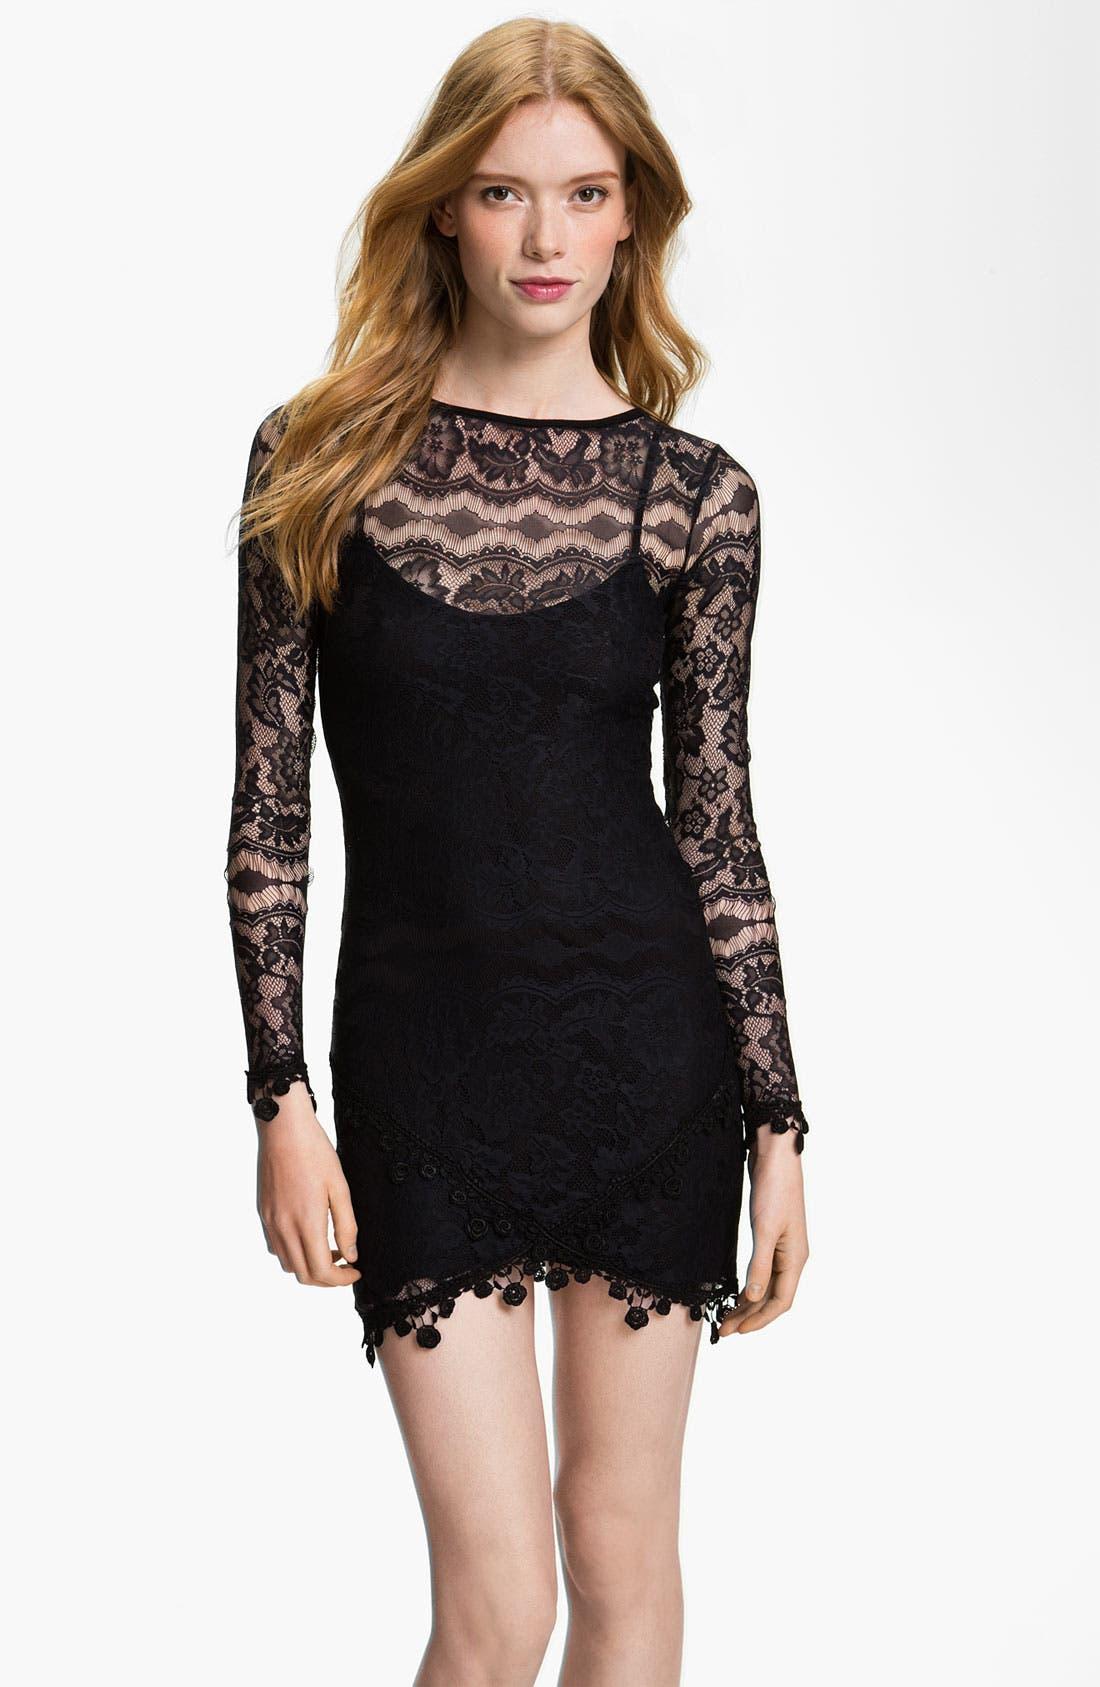 Alternate Image 1 Selected - For Love & Lemons Lace Dress